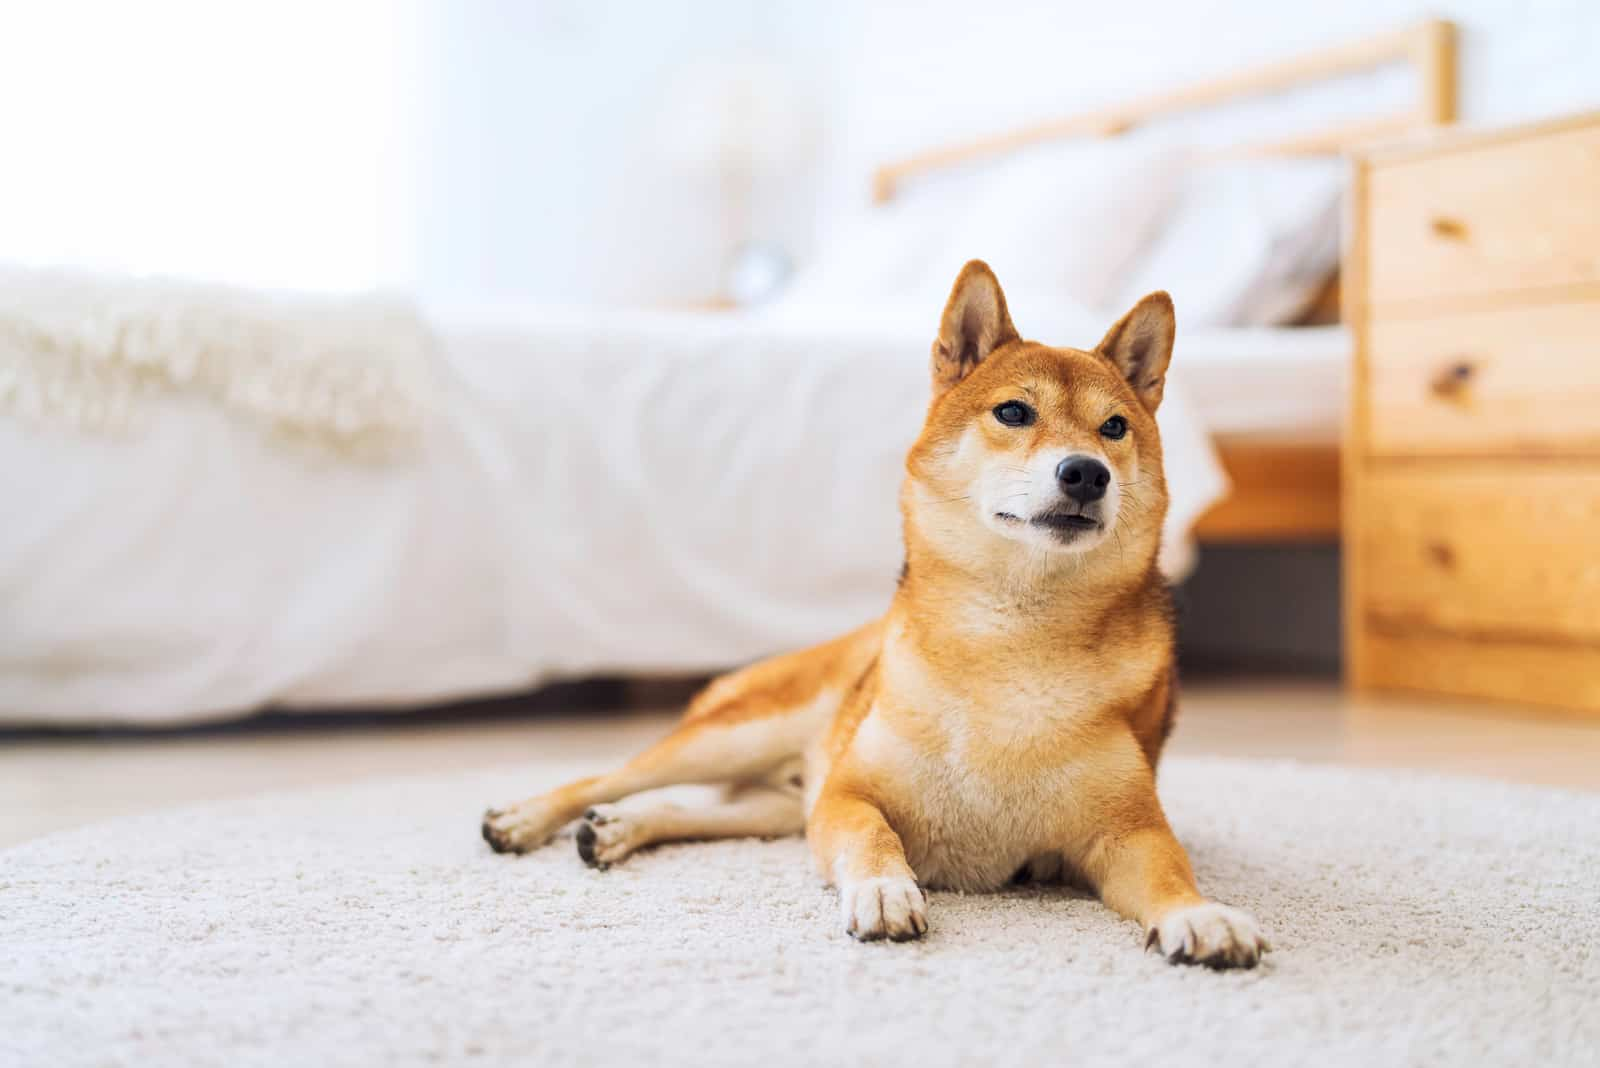 Japanese Shiba Inu dog in bedroom